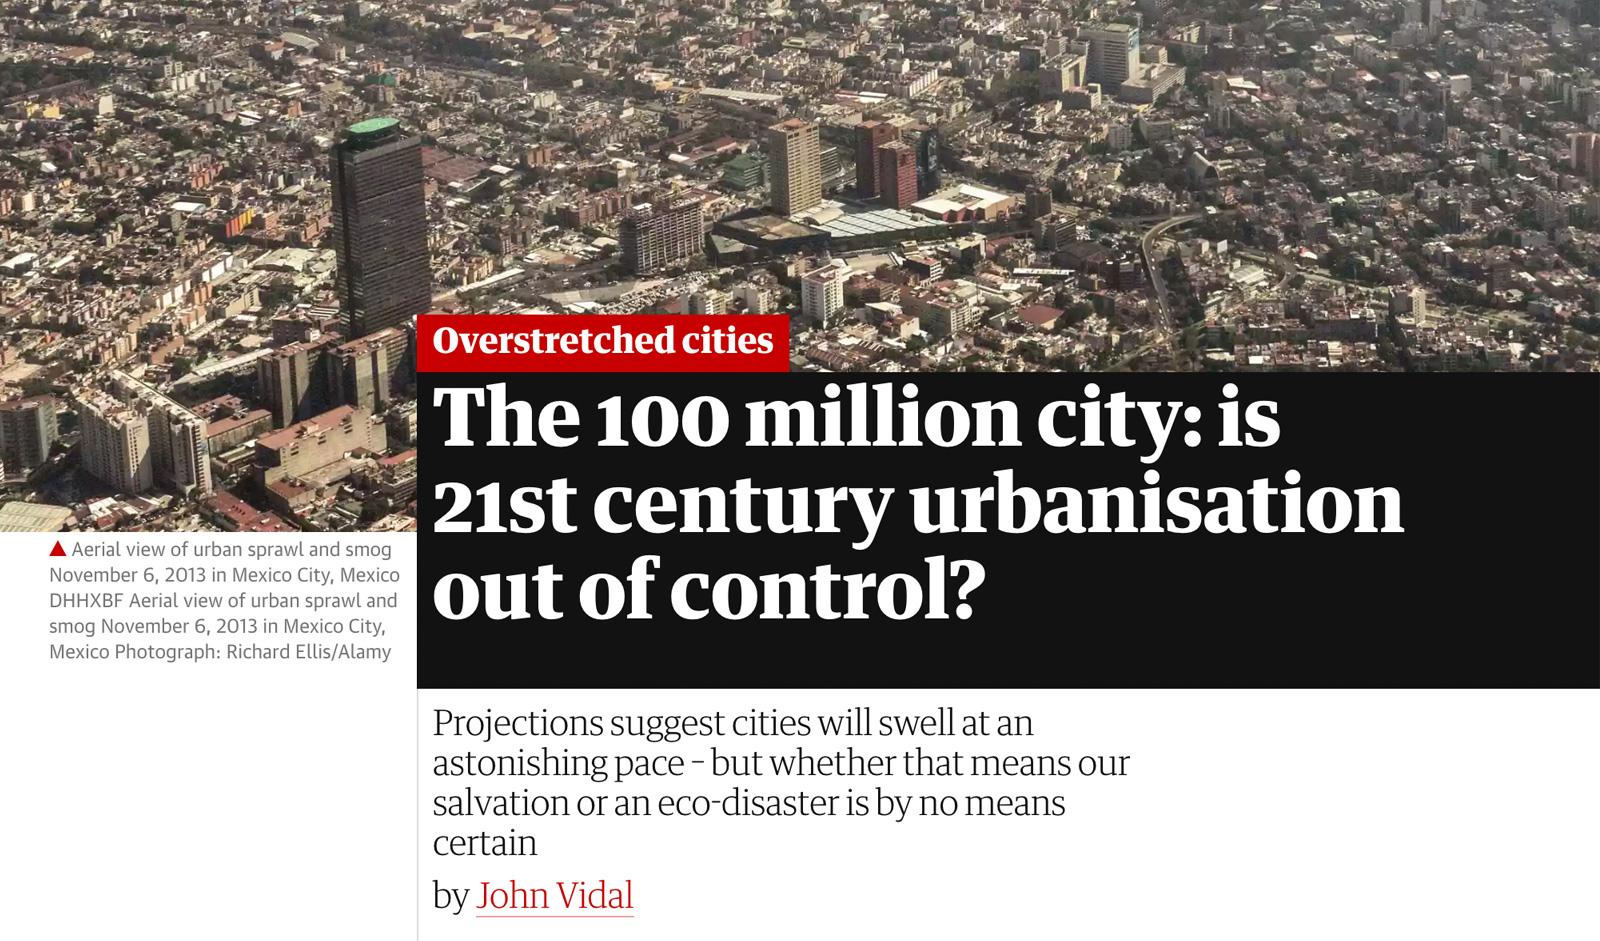 Figura 4. Una mirada al futuro de las ciudades, John Vidal, The Guardian.